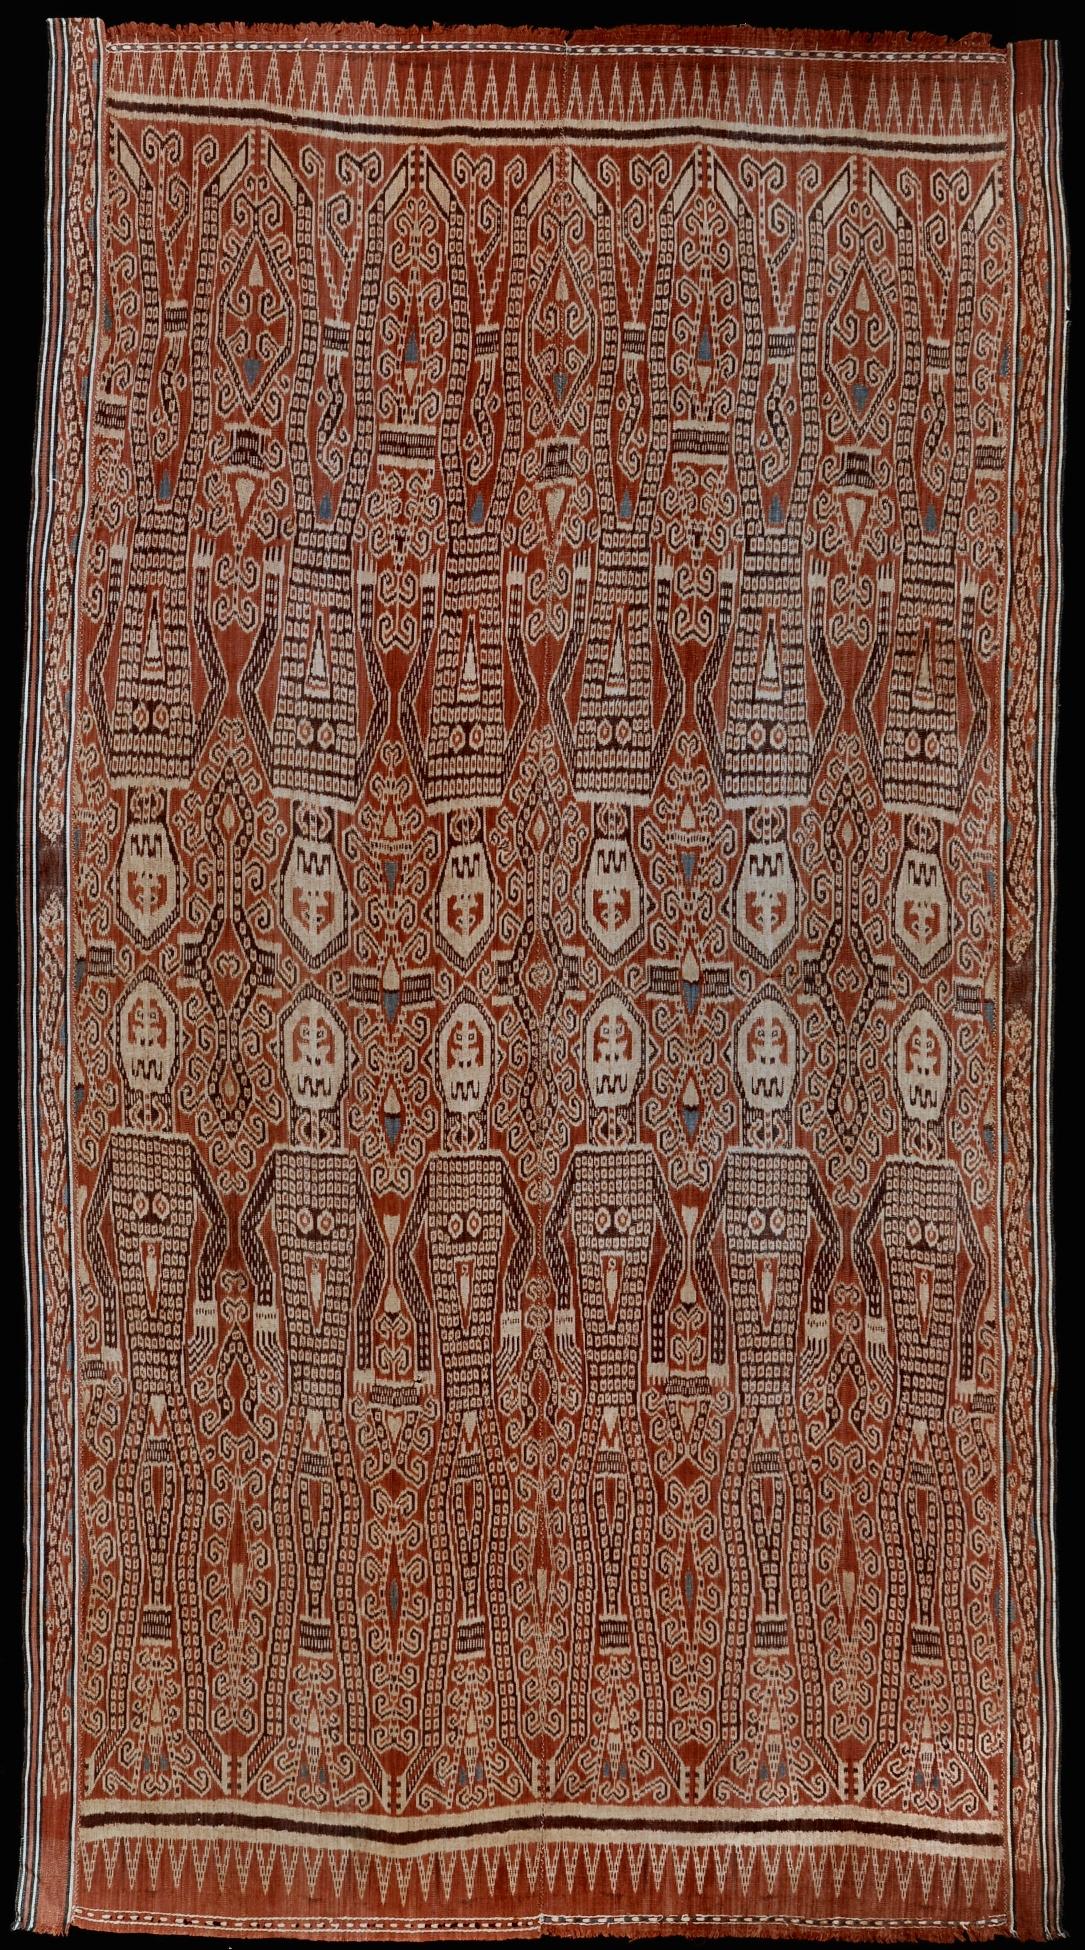 Borneo, Sarawak Iban people  Pua , ritual blanket Warp ikat in hand-spun cotton 1925–1945